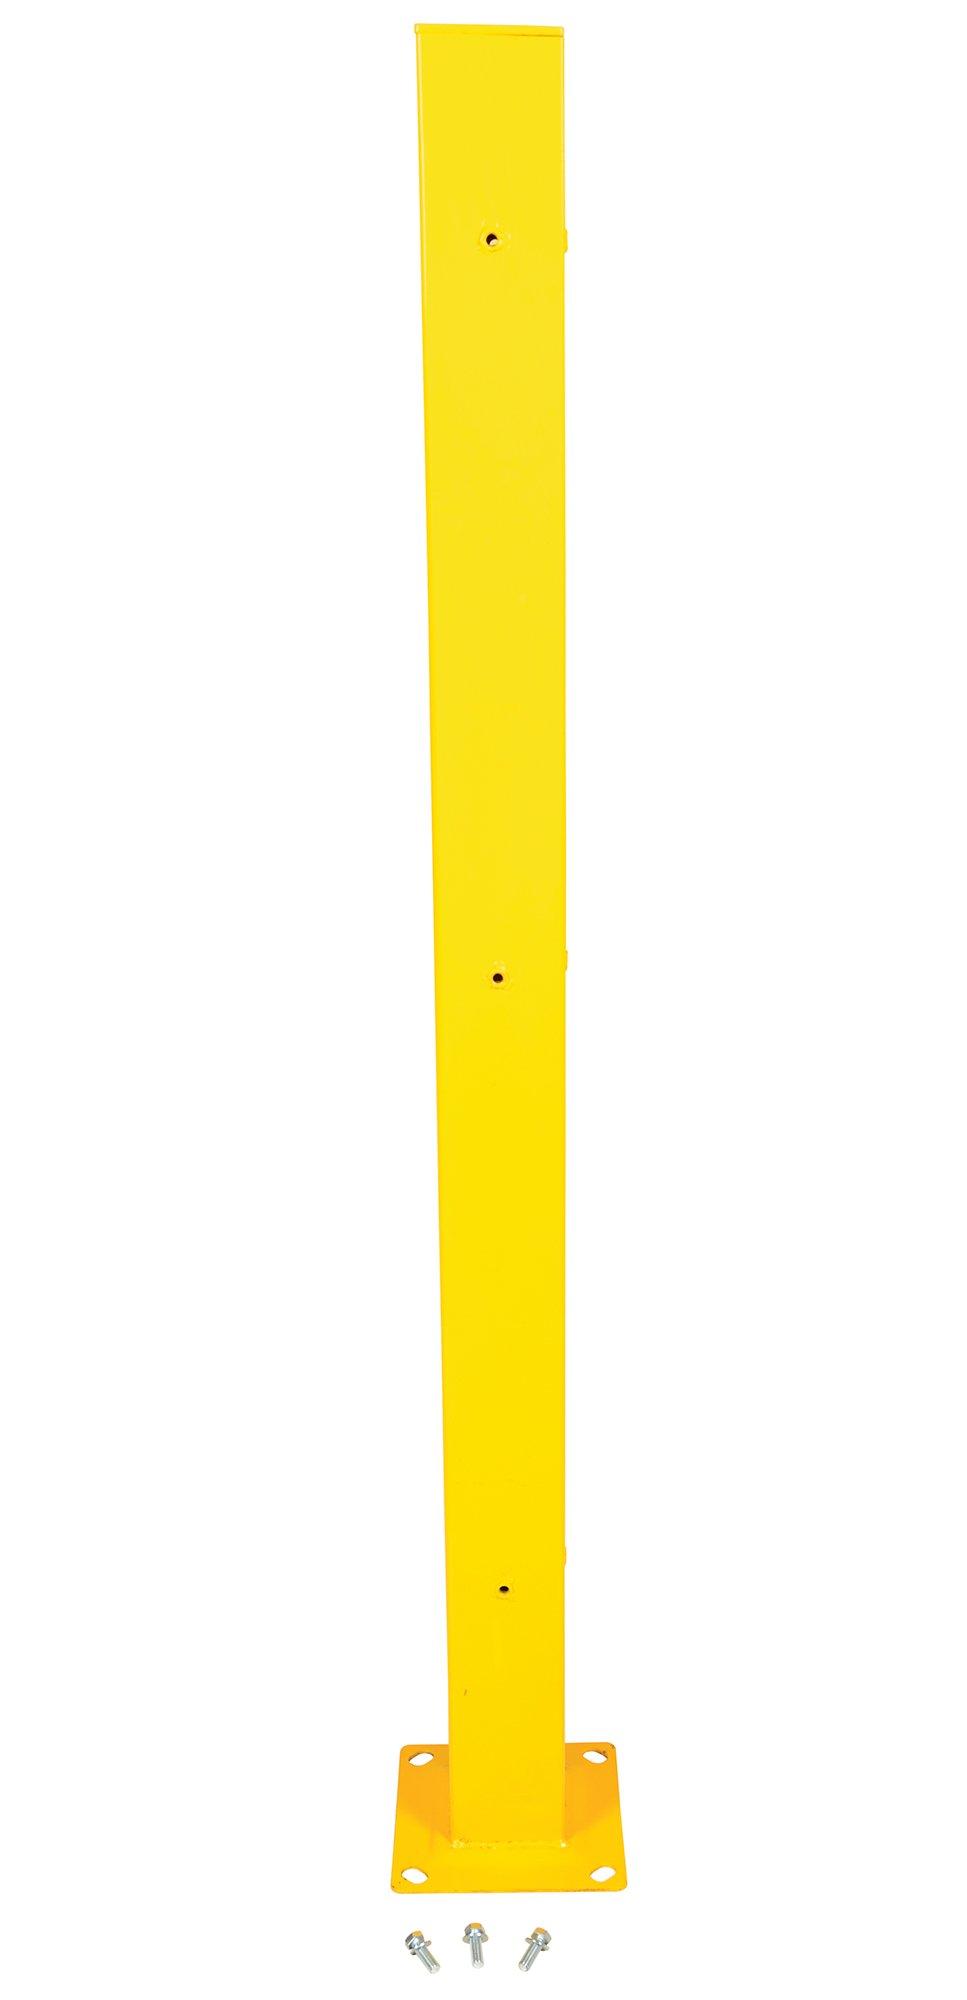 Vestil Tubular Post for Structural Guard Rail - 72 Inch H, Model STGR-TP-72DI